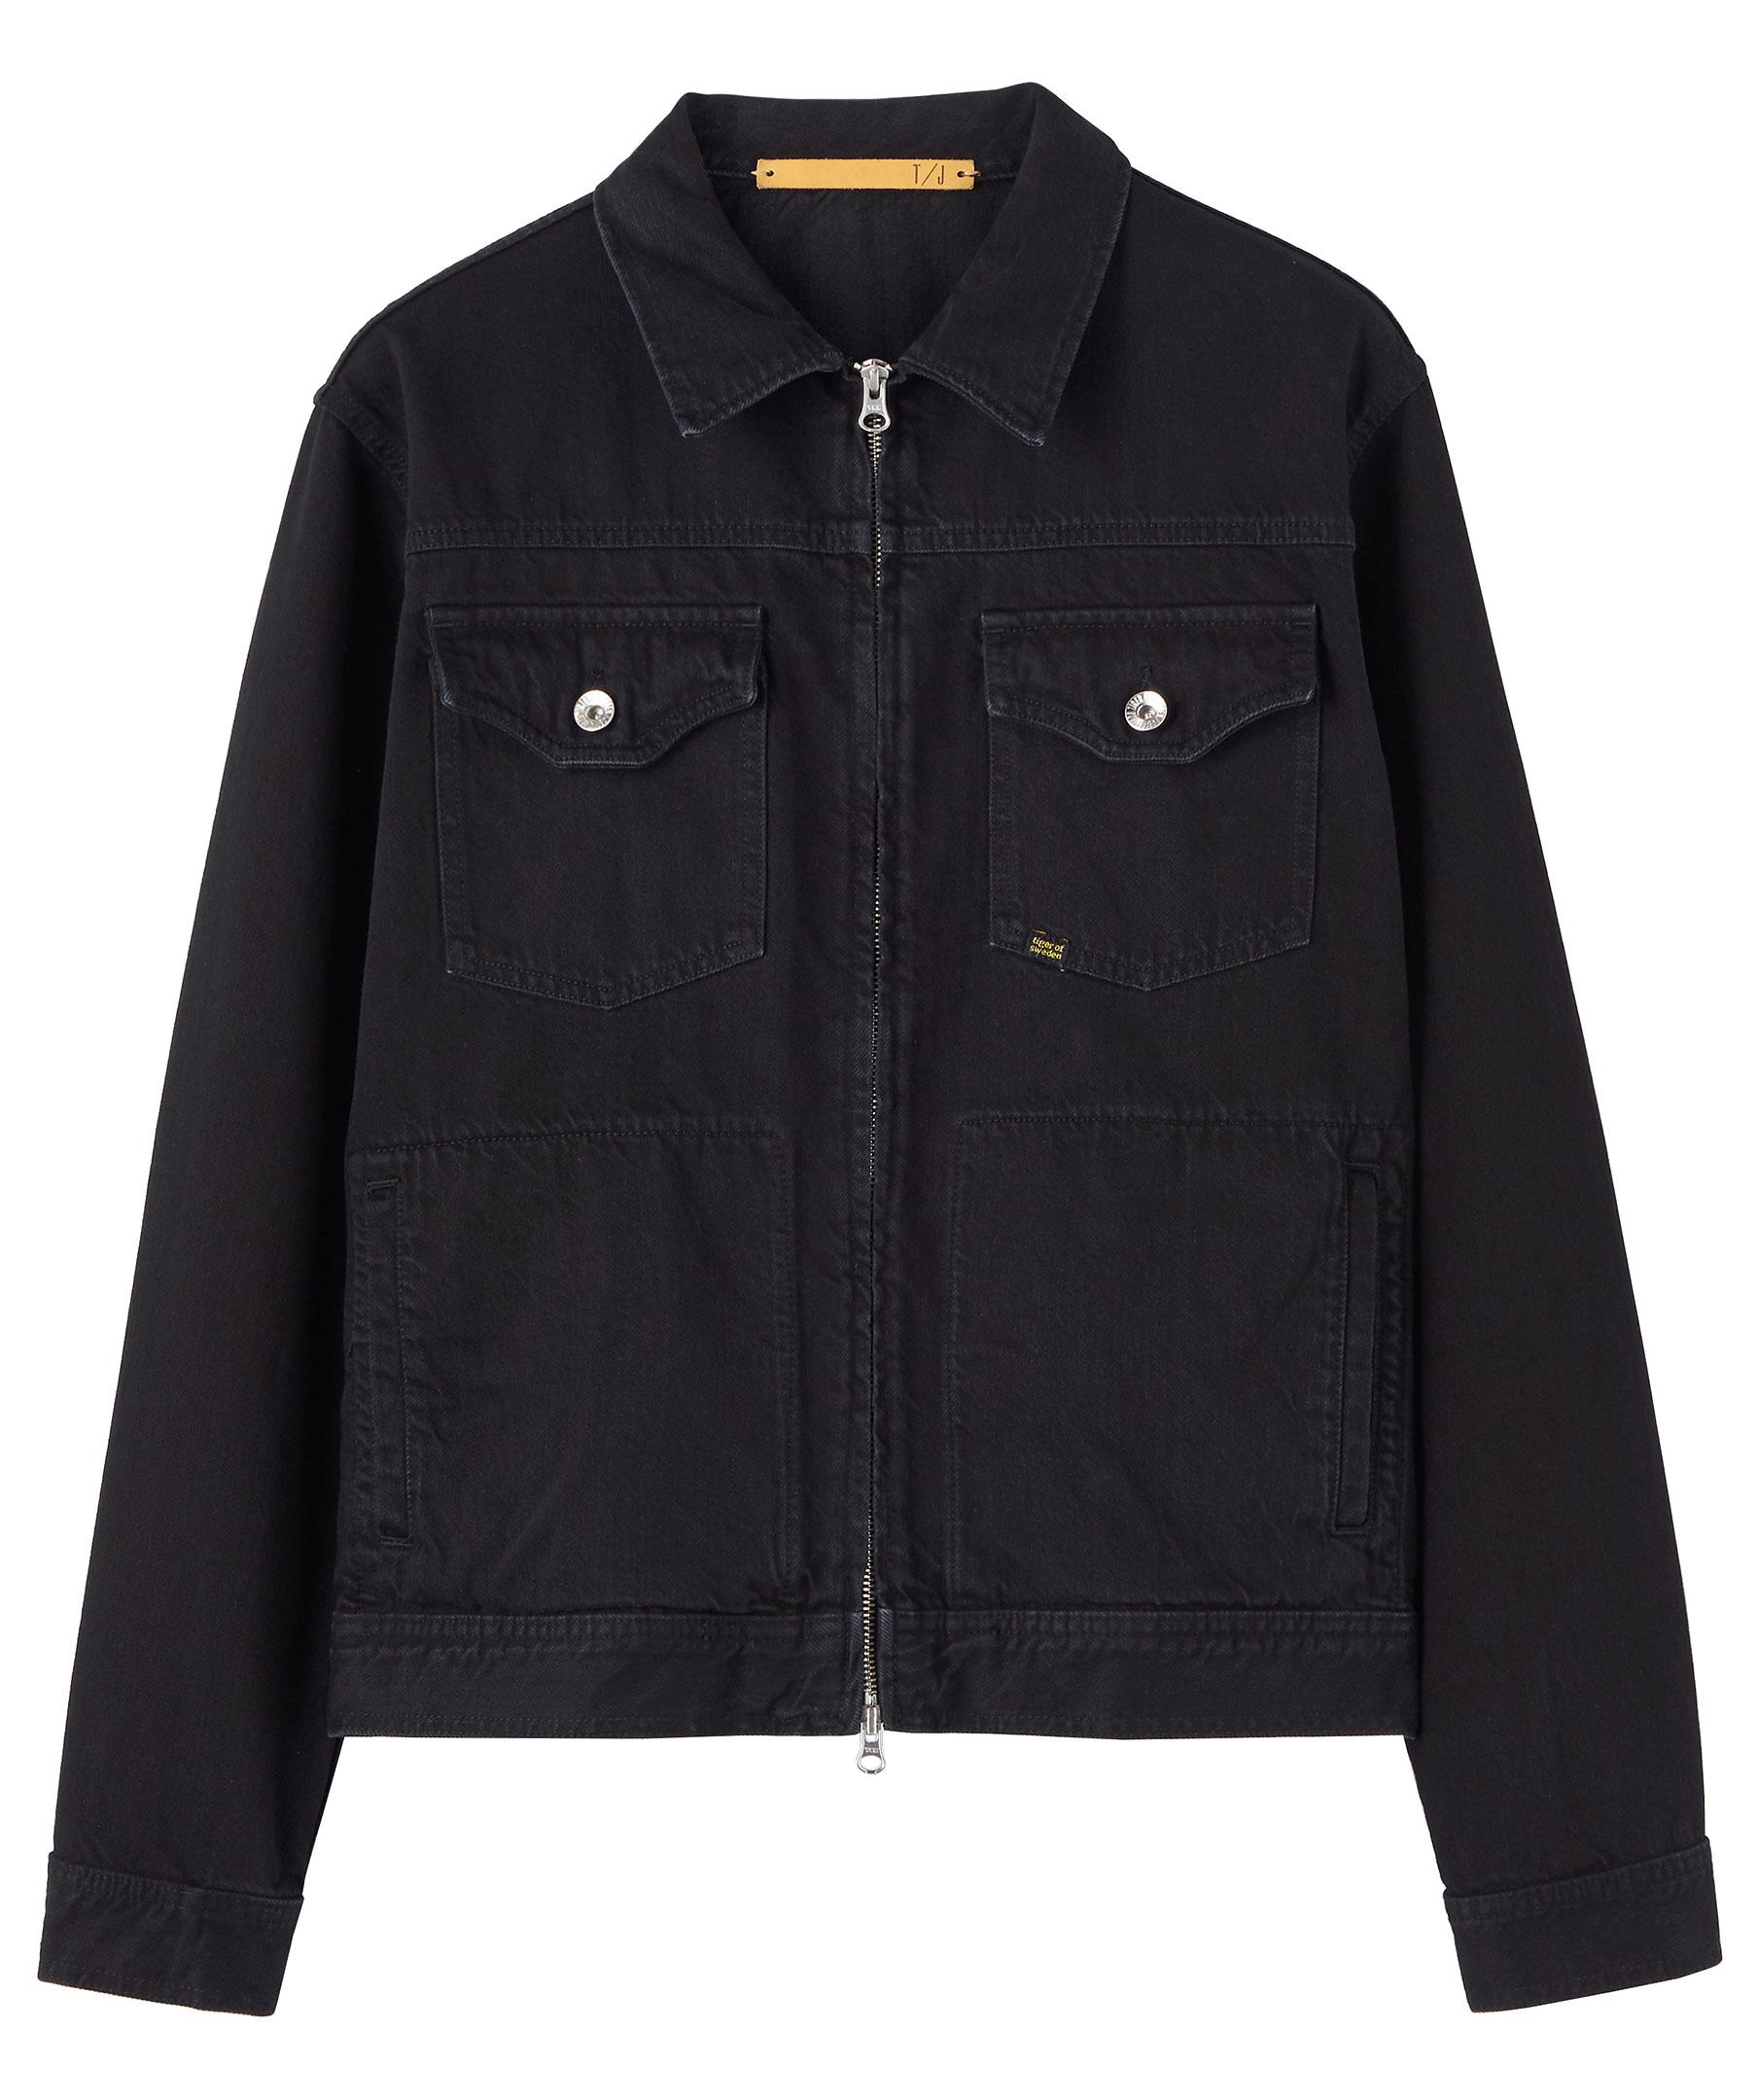 Johnells Jeansjackor: 1 Produkter | Stylight